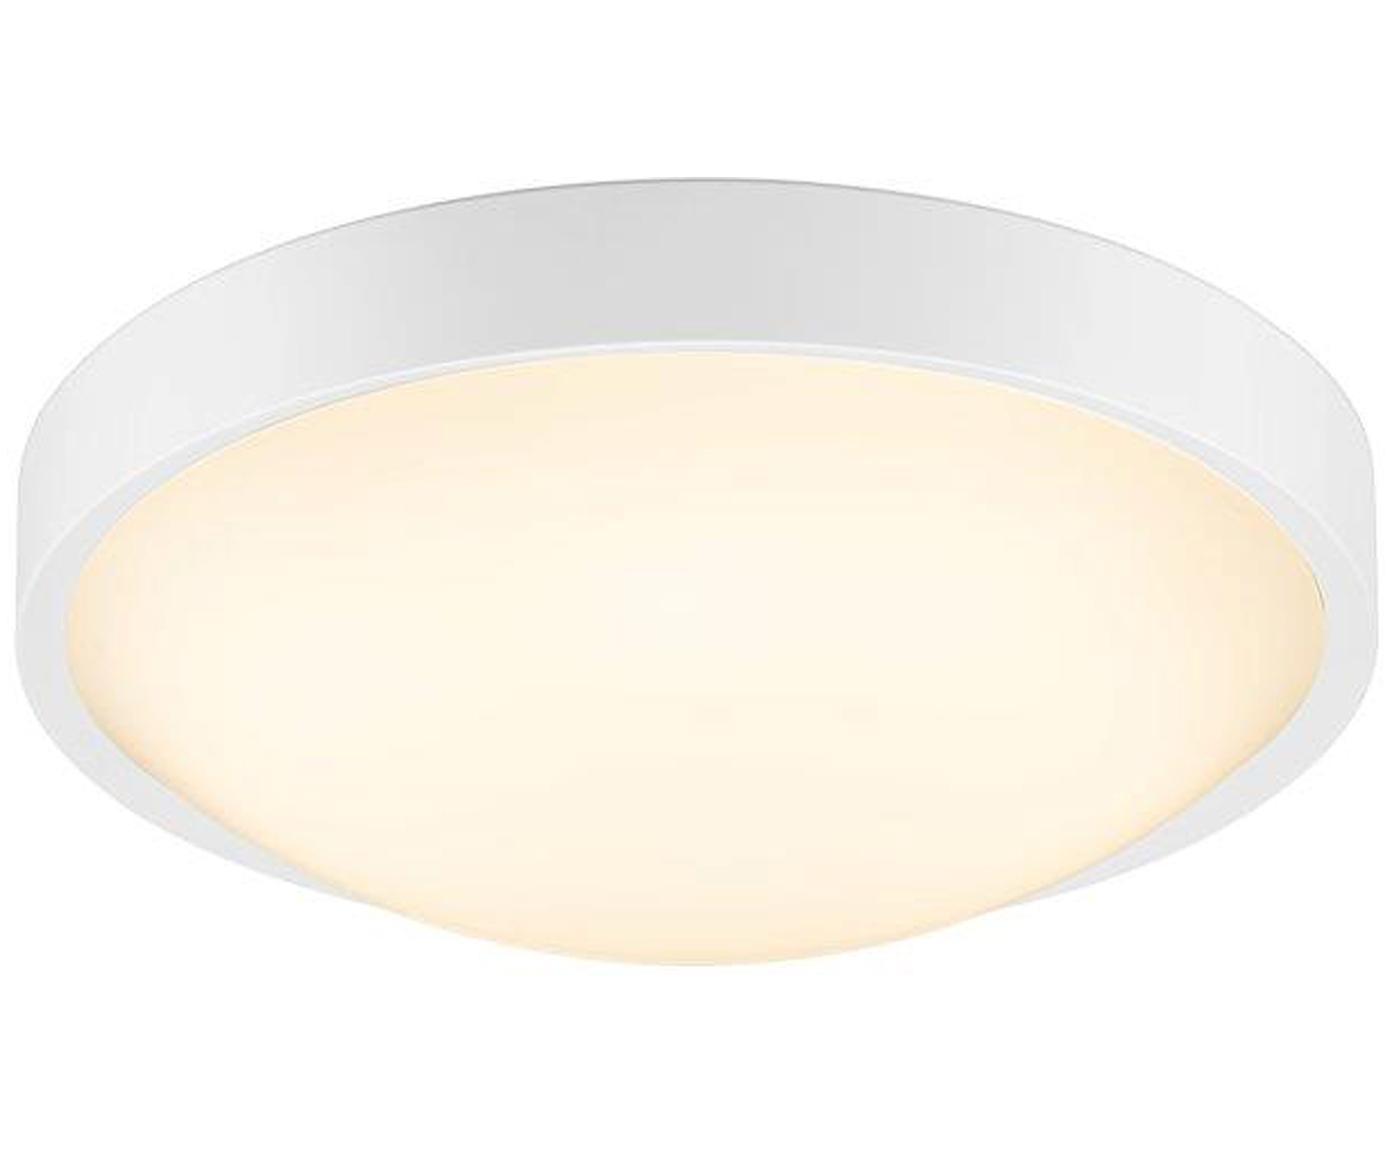 Plafoniera a LED Altus, Materiale sintetico, Bianco, Ø 30 x Alt. 9 cm